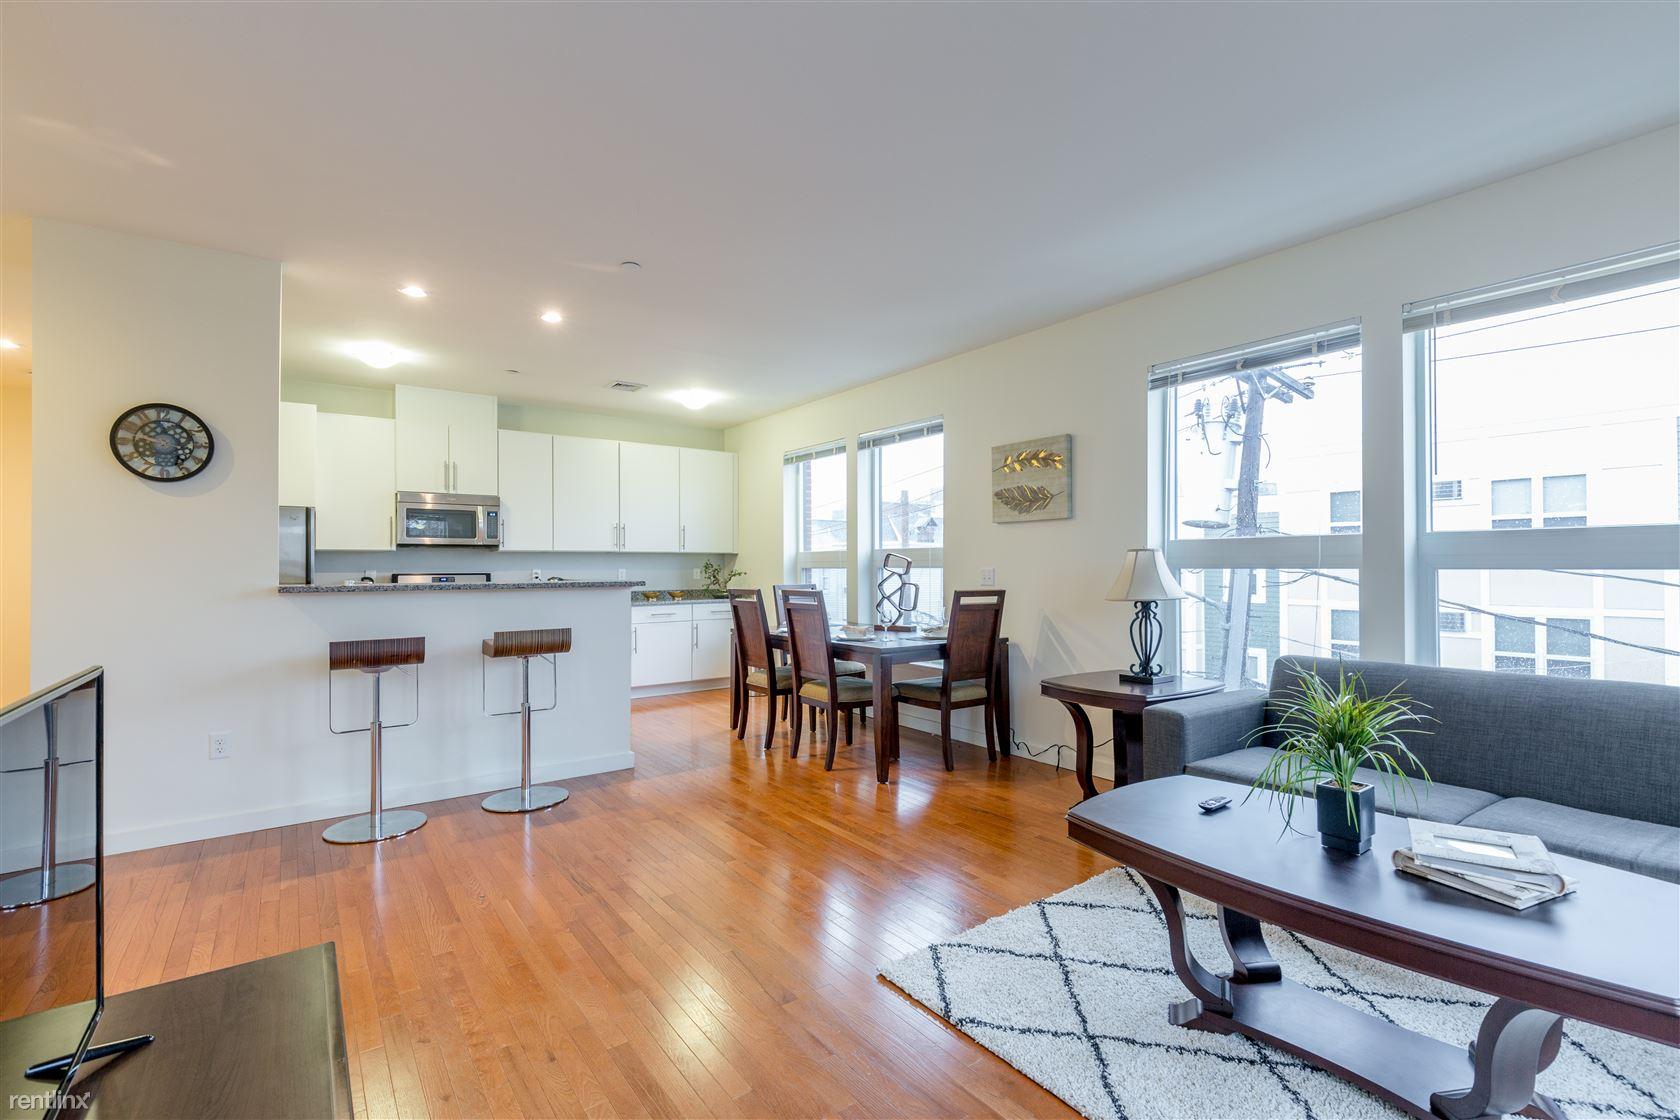 56 Gerrish Avenue, Chelsea, MA - $2,300